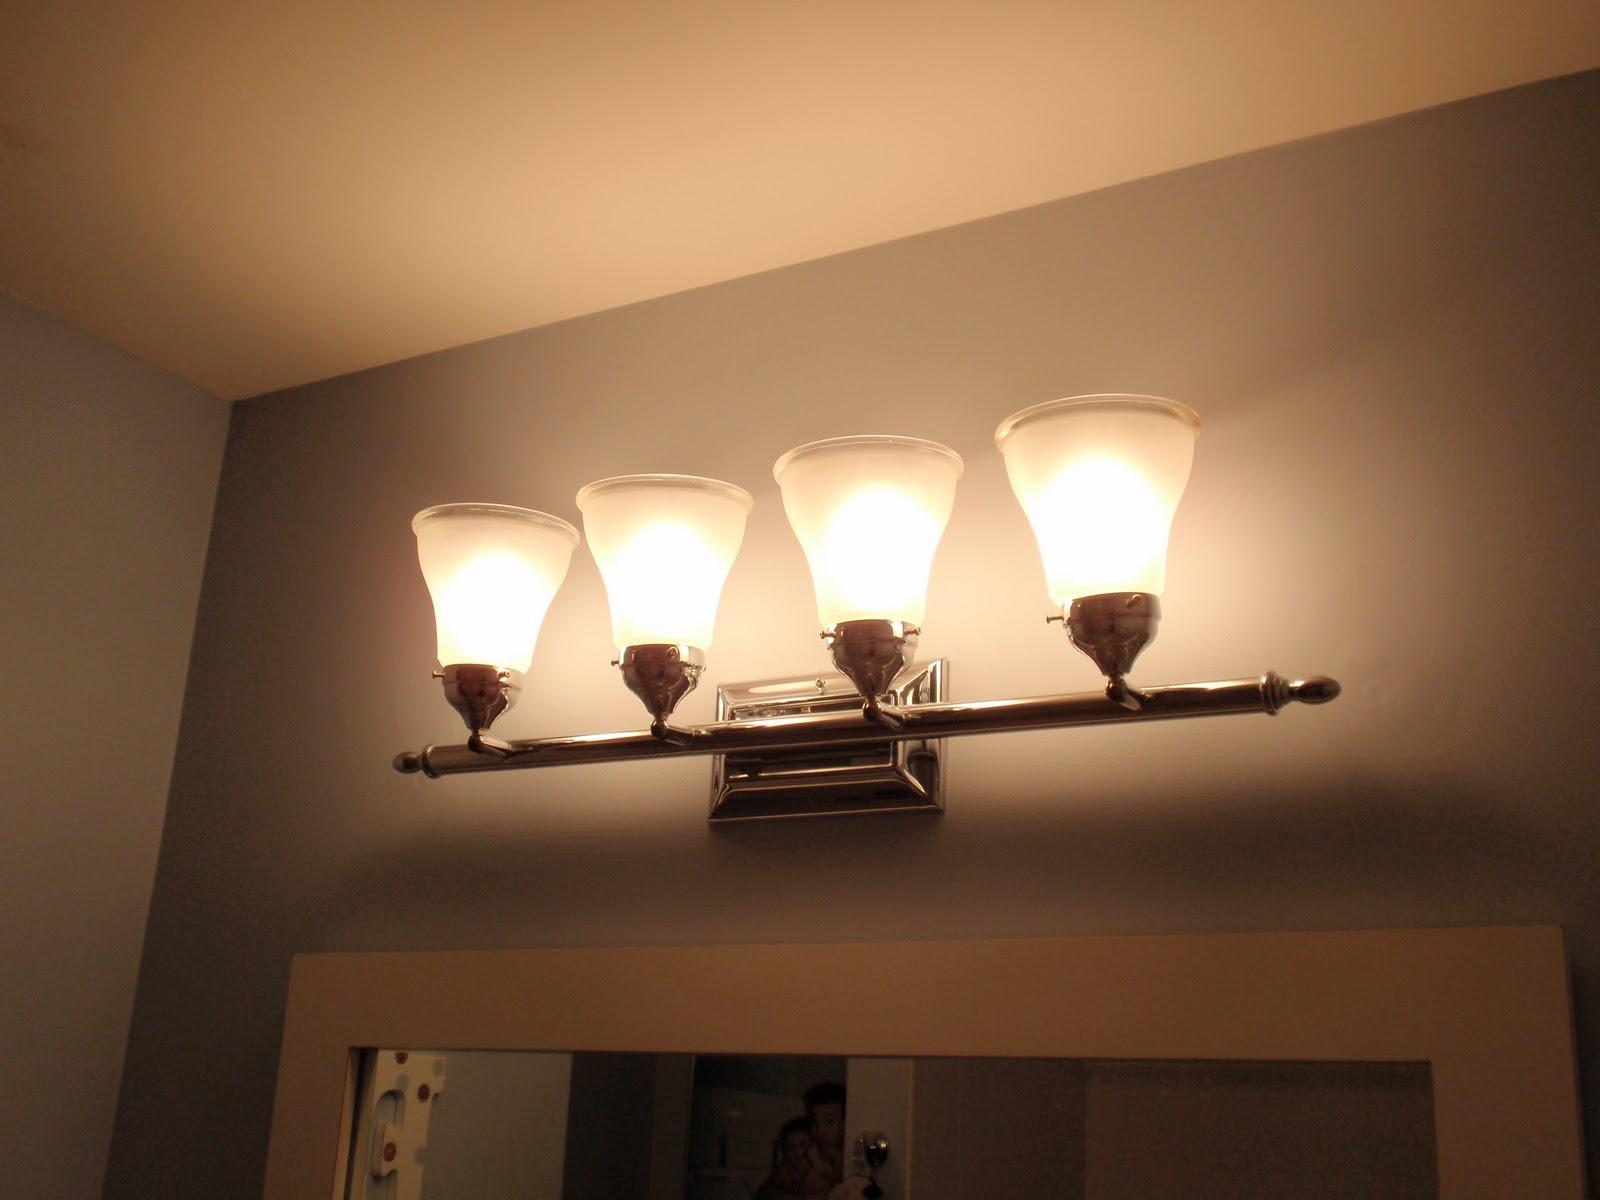 Bathroom Ceiling Light Fixtures Lowes